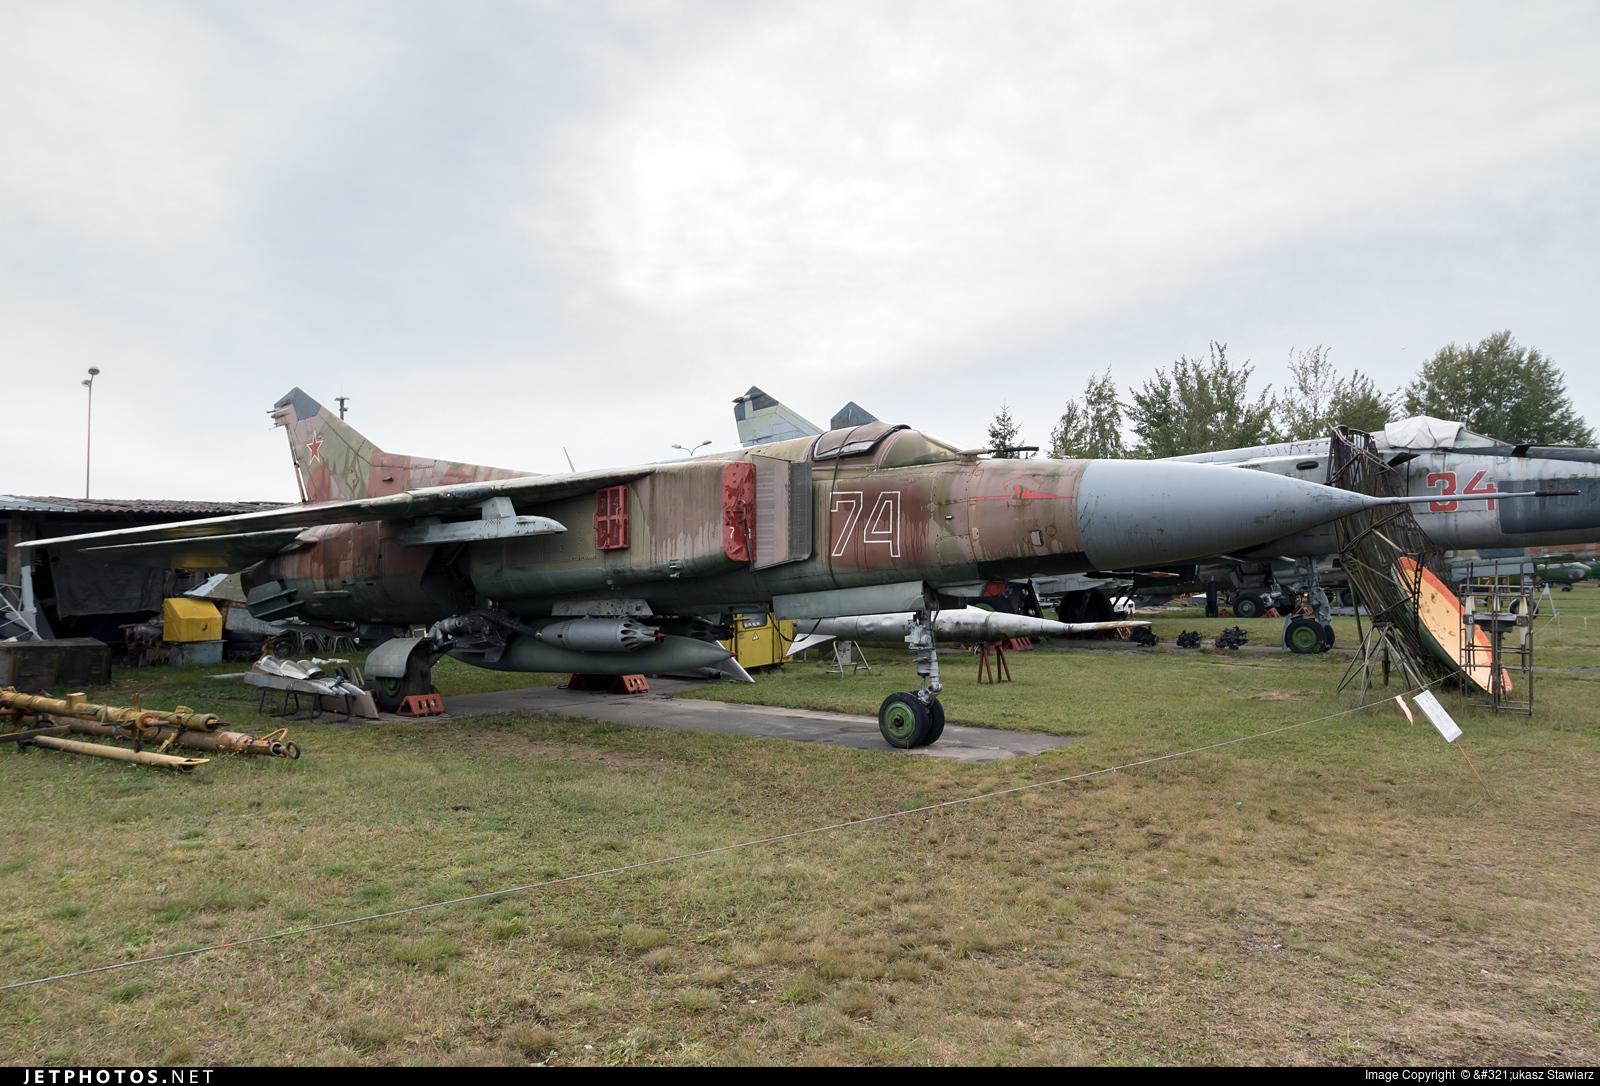 74 - Mikoyan-Gurevich MiG-23ML Flogger G - Russia - Air Force